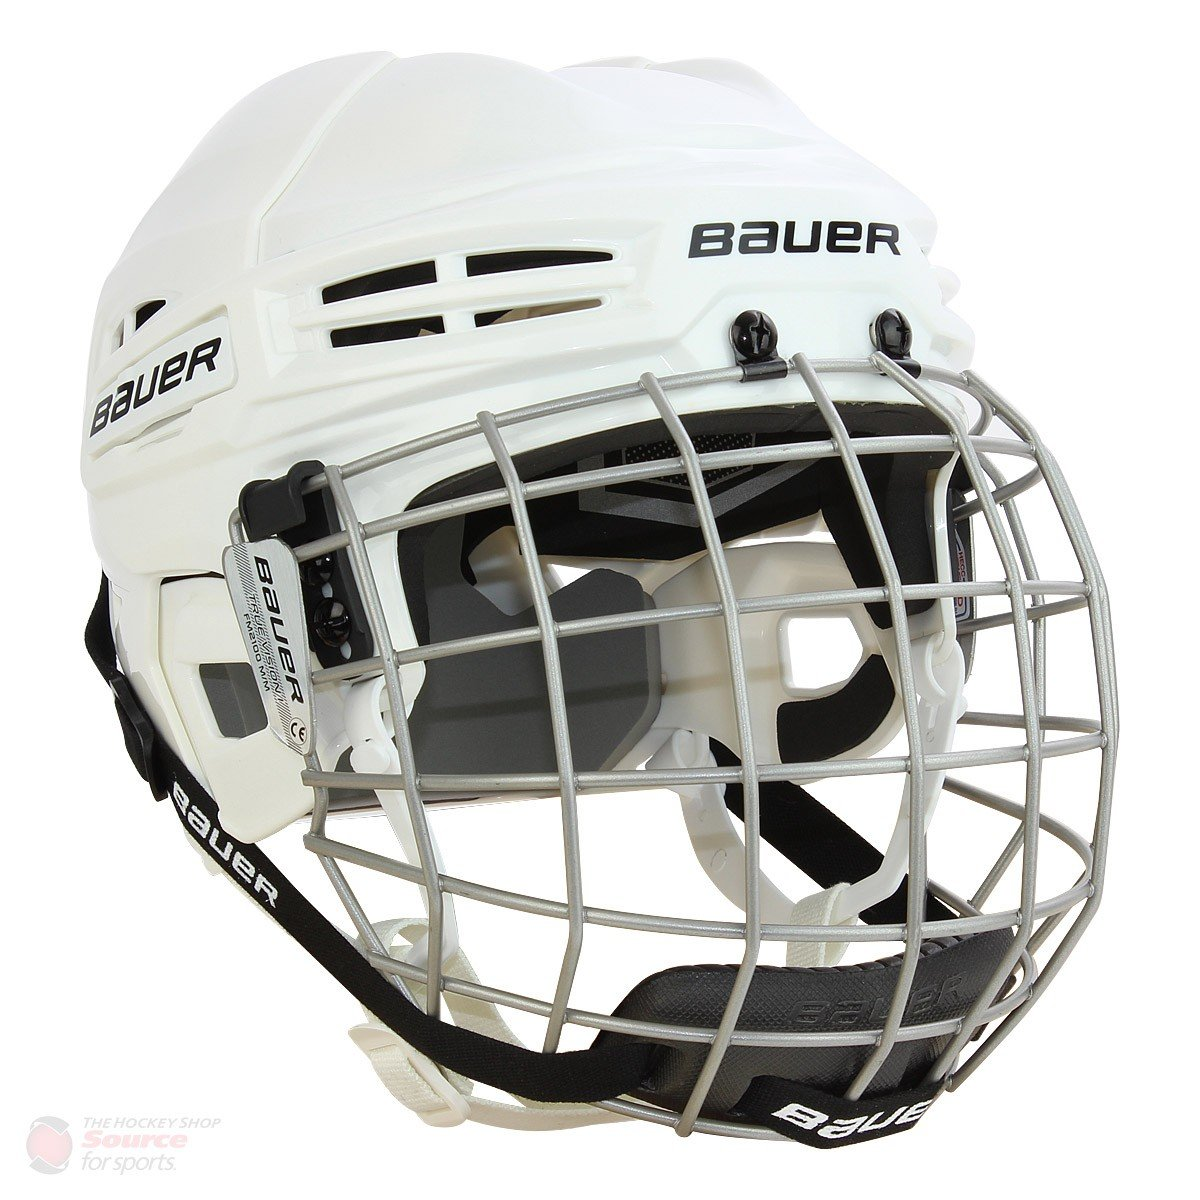 Bauer IMS 5.0Casque de Hockey Combo